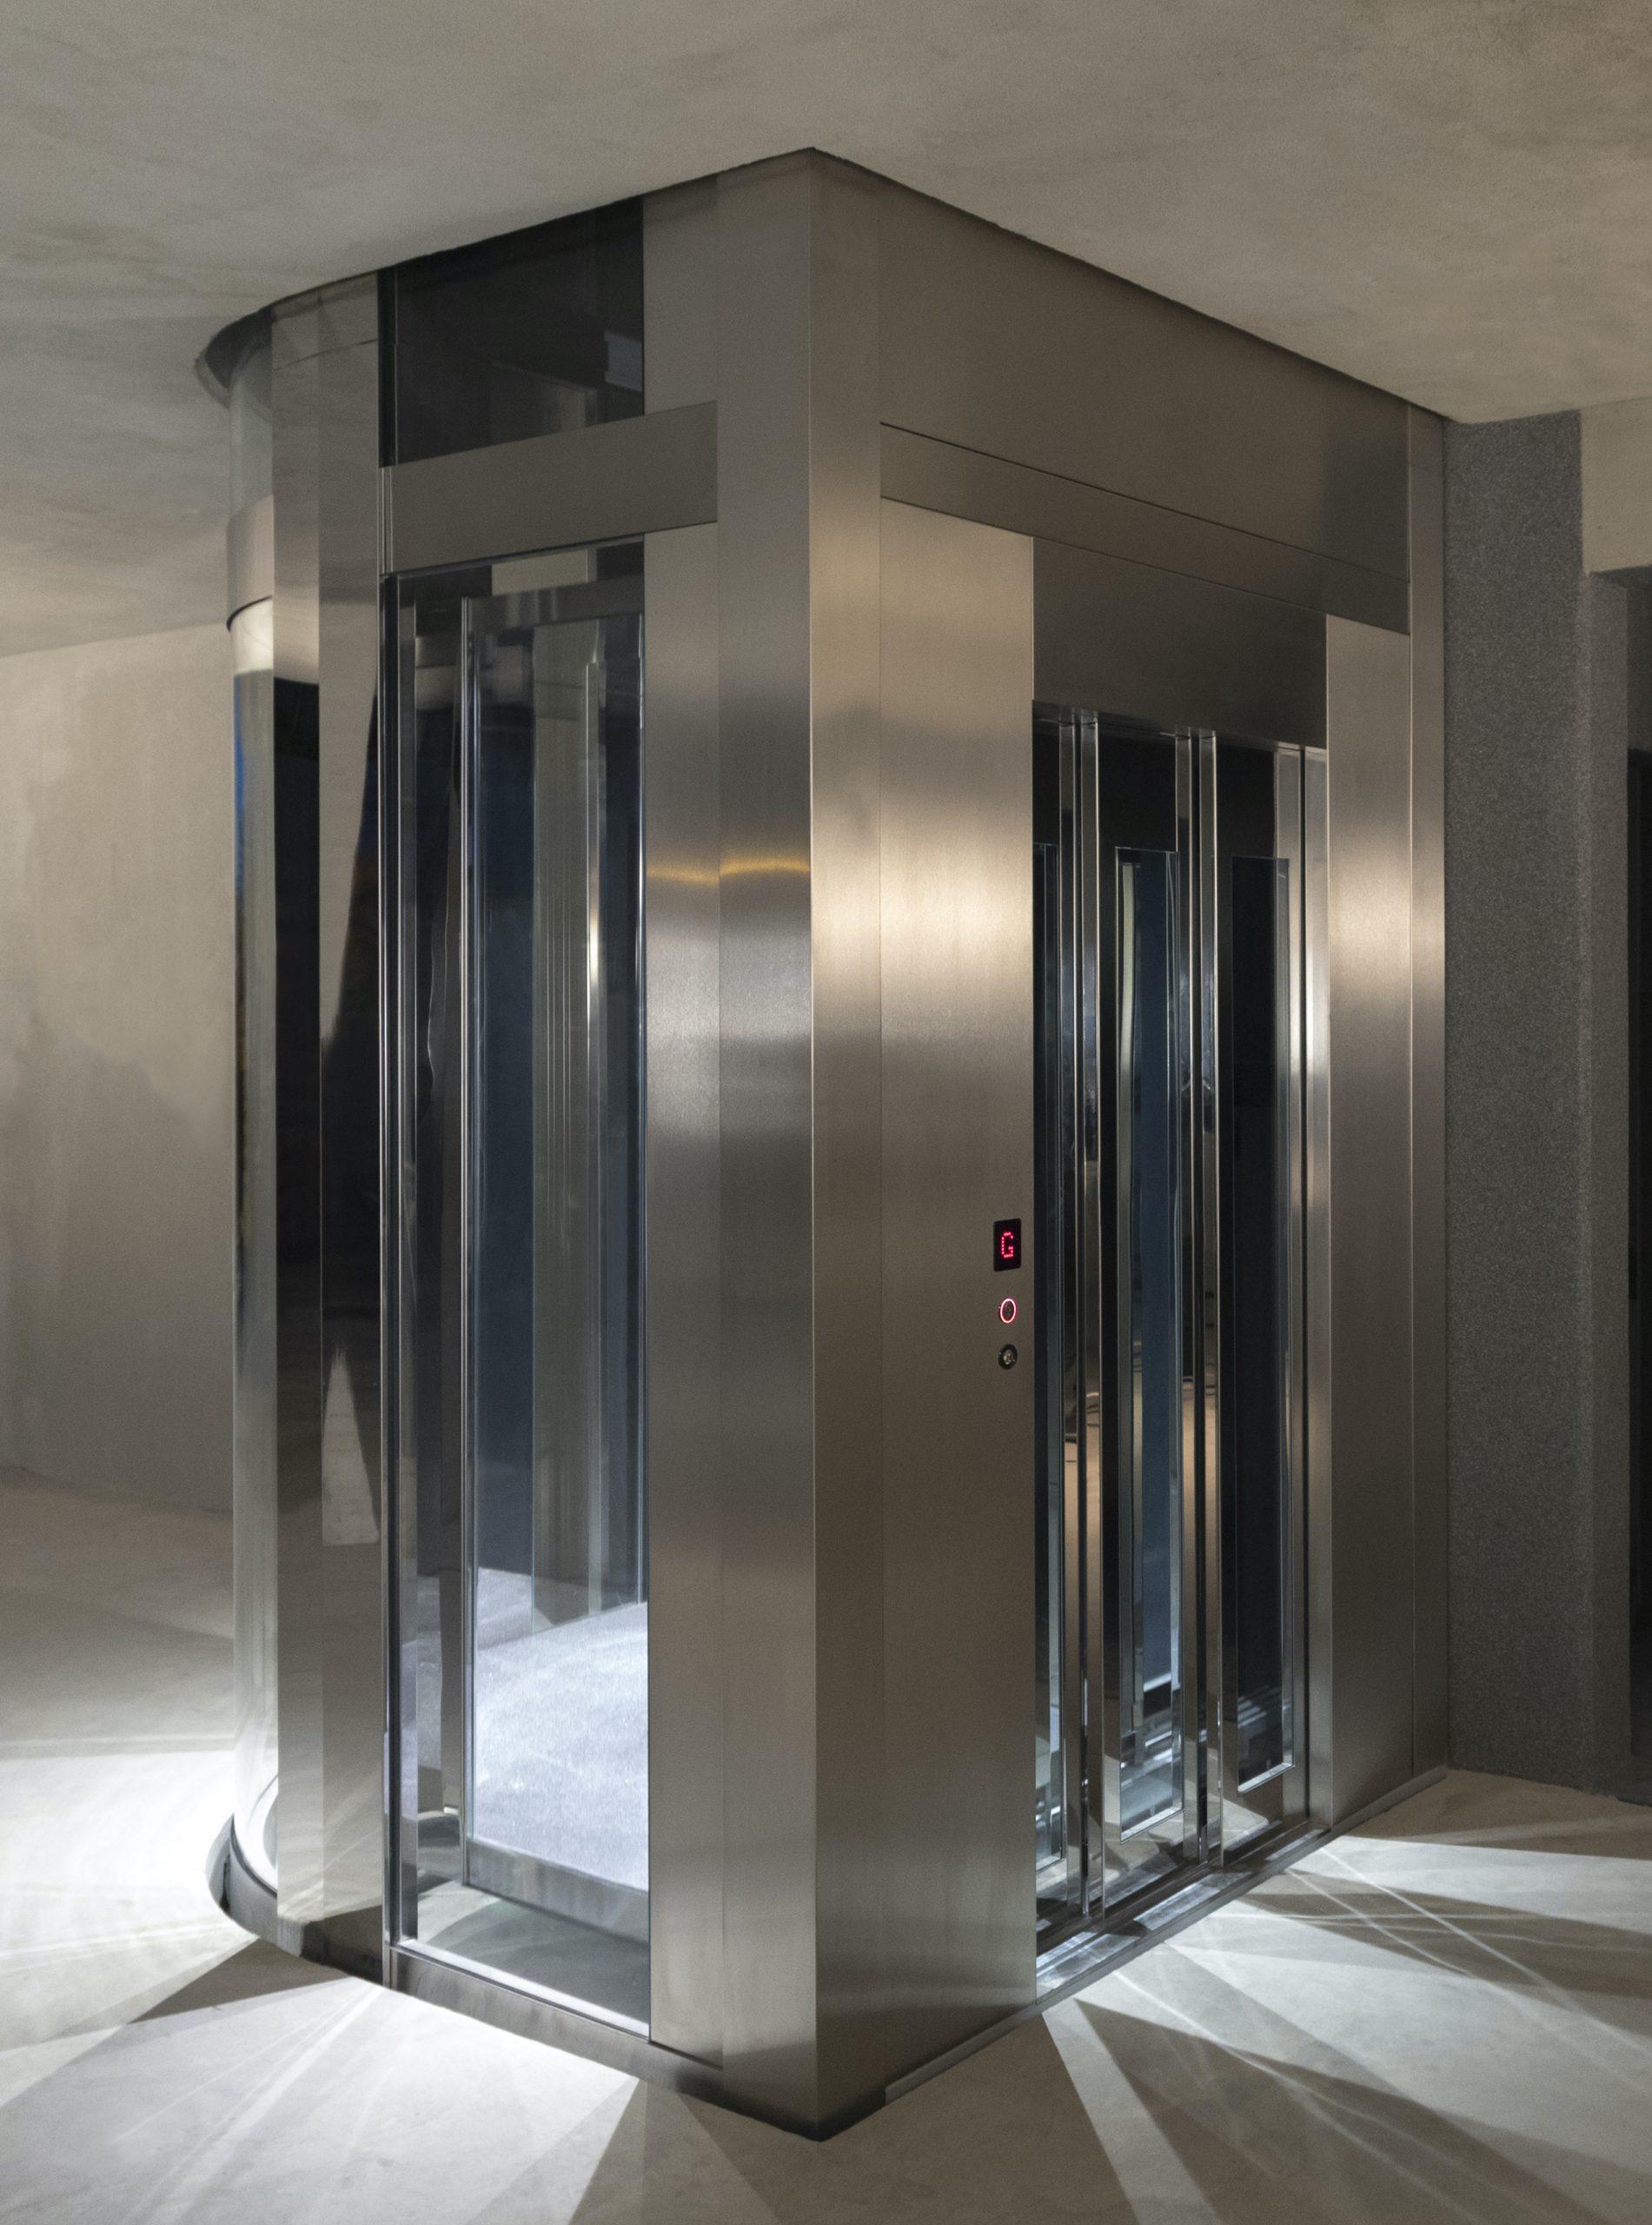 home lifts perth - residential jewel lift - western australia